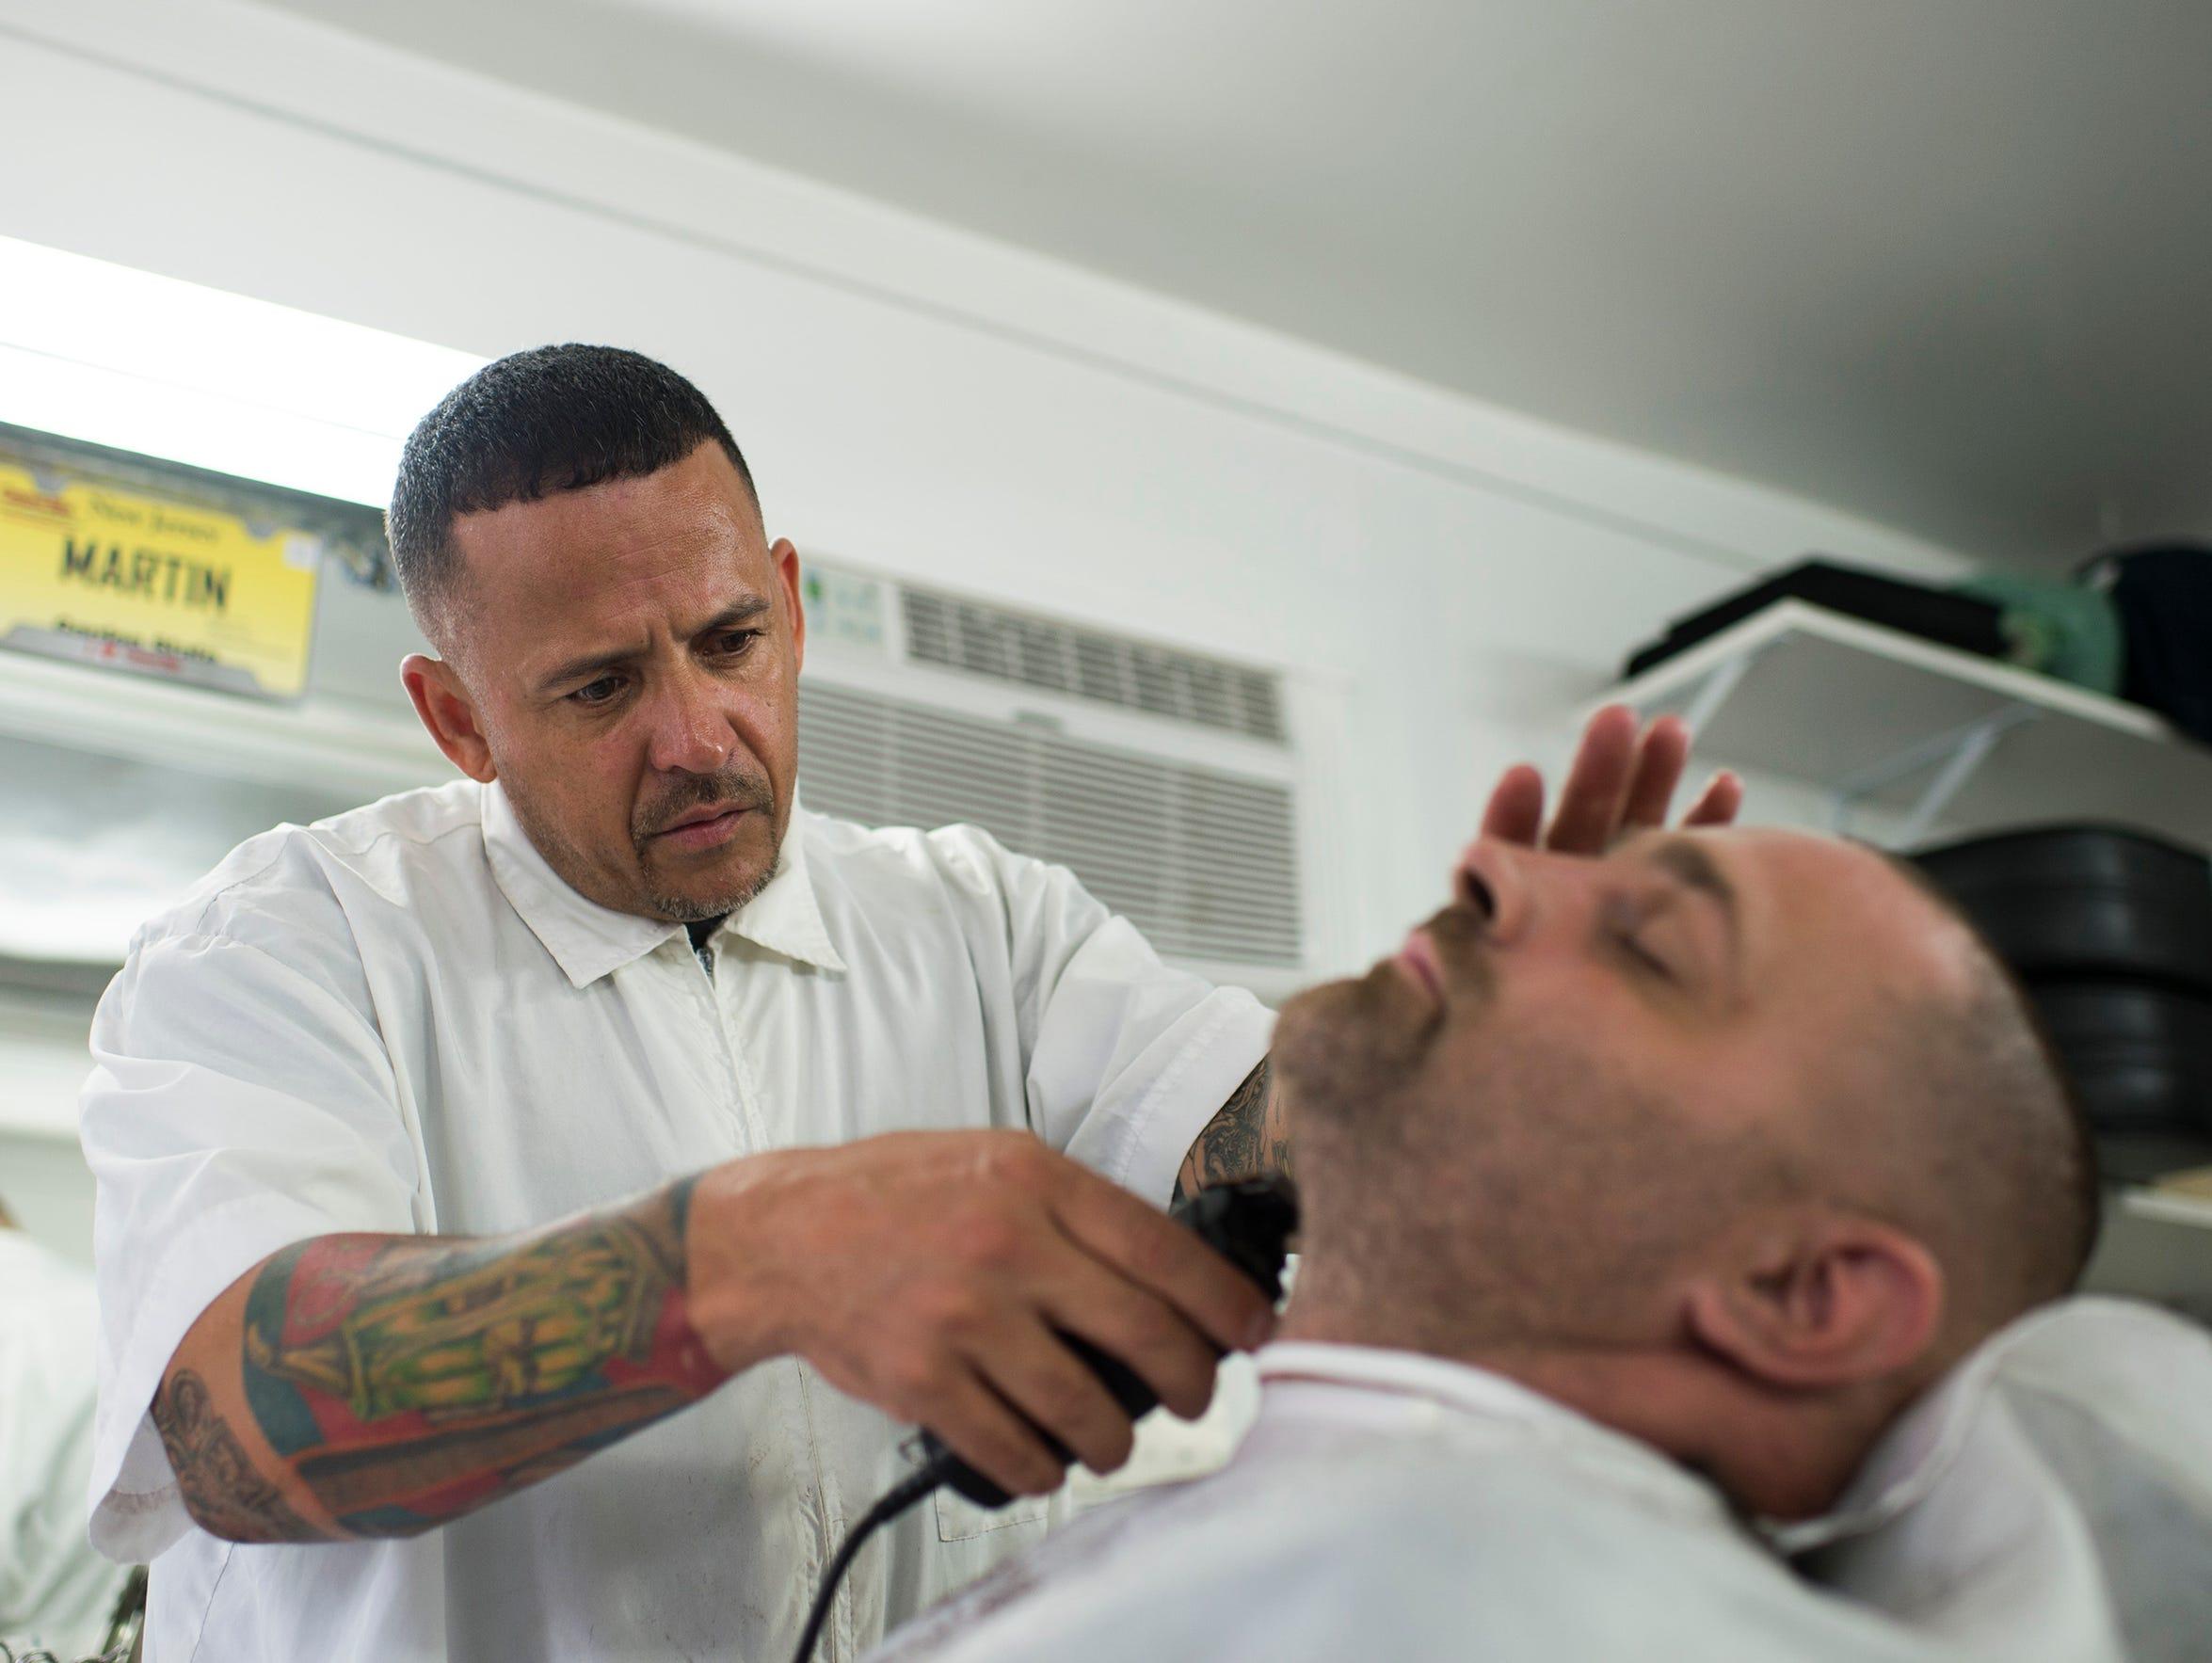 Martin Ortiz, 47, left, owner of Martin's Da Shop in